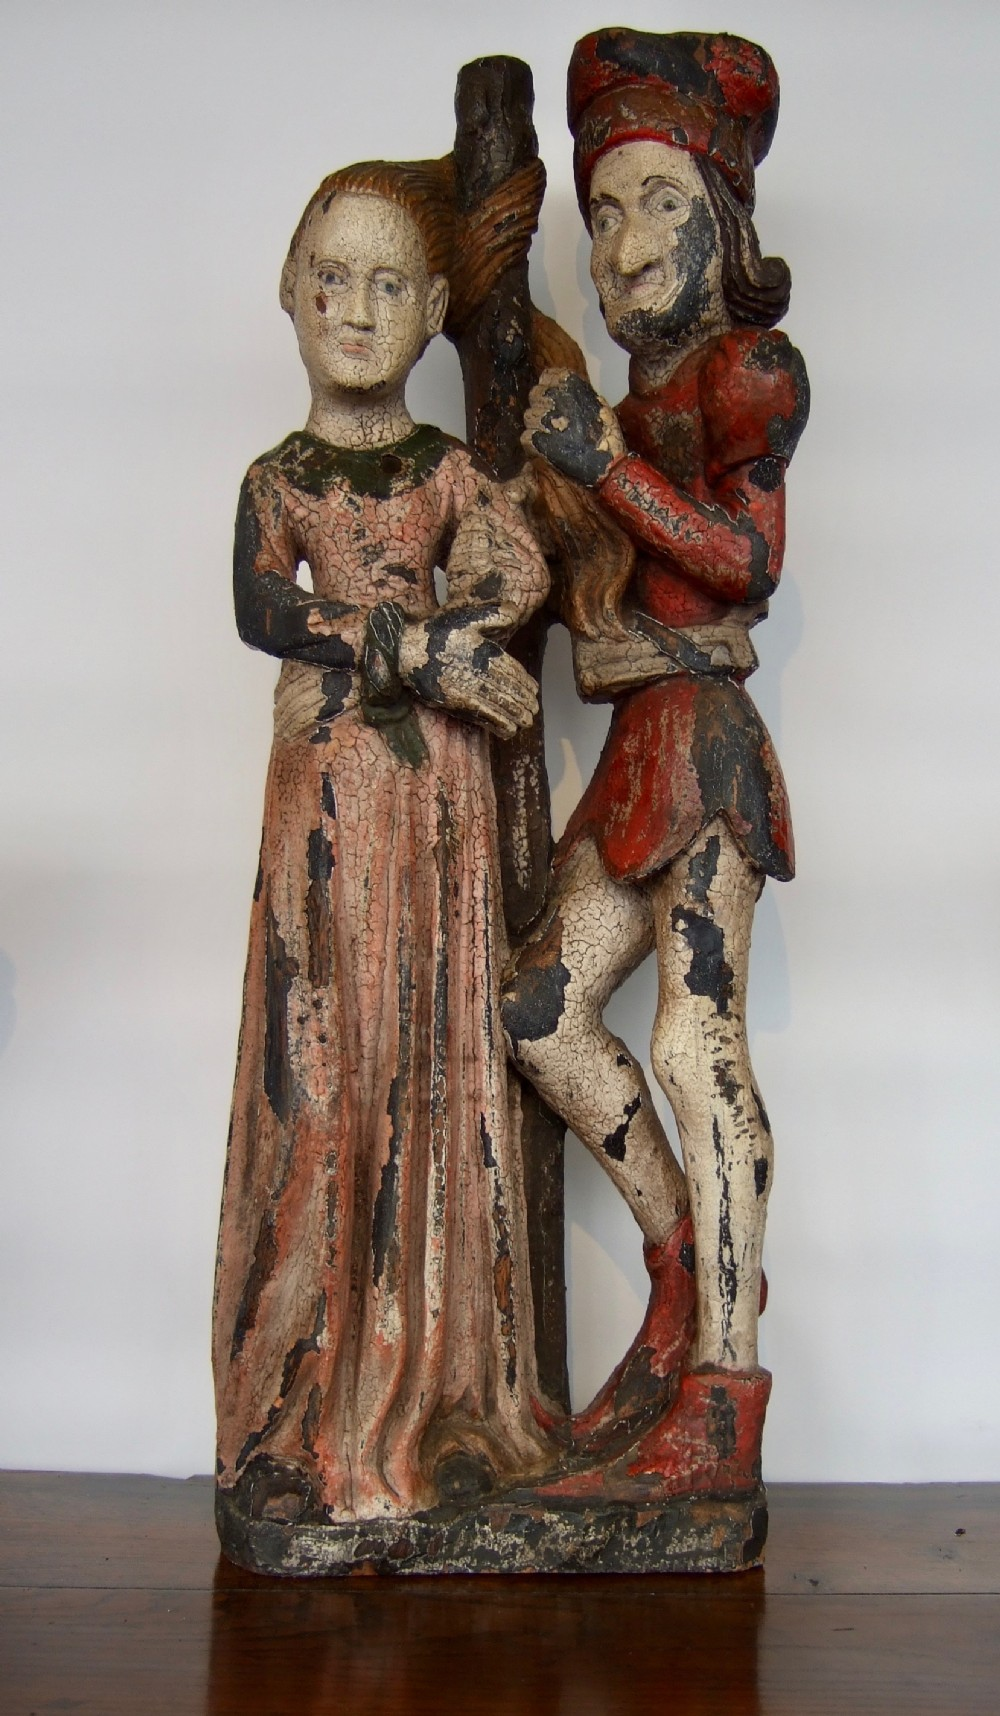 duke of burgundy with joan d'ark polychrome wood carving